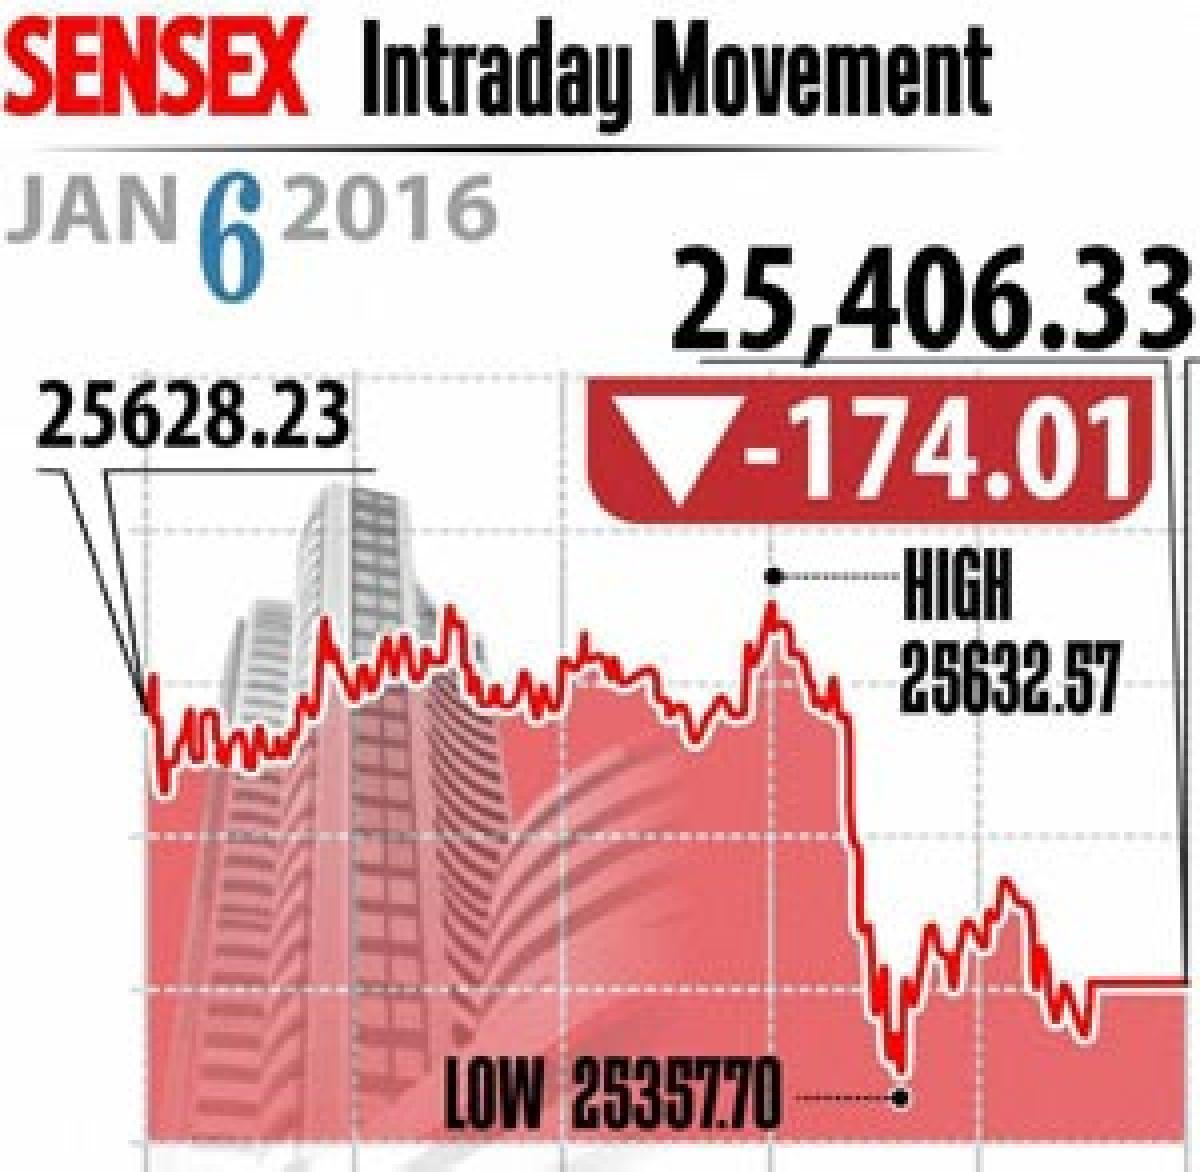 Global concerns weigh on markets